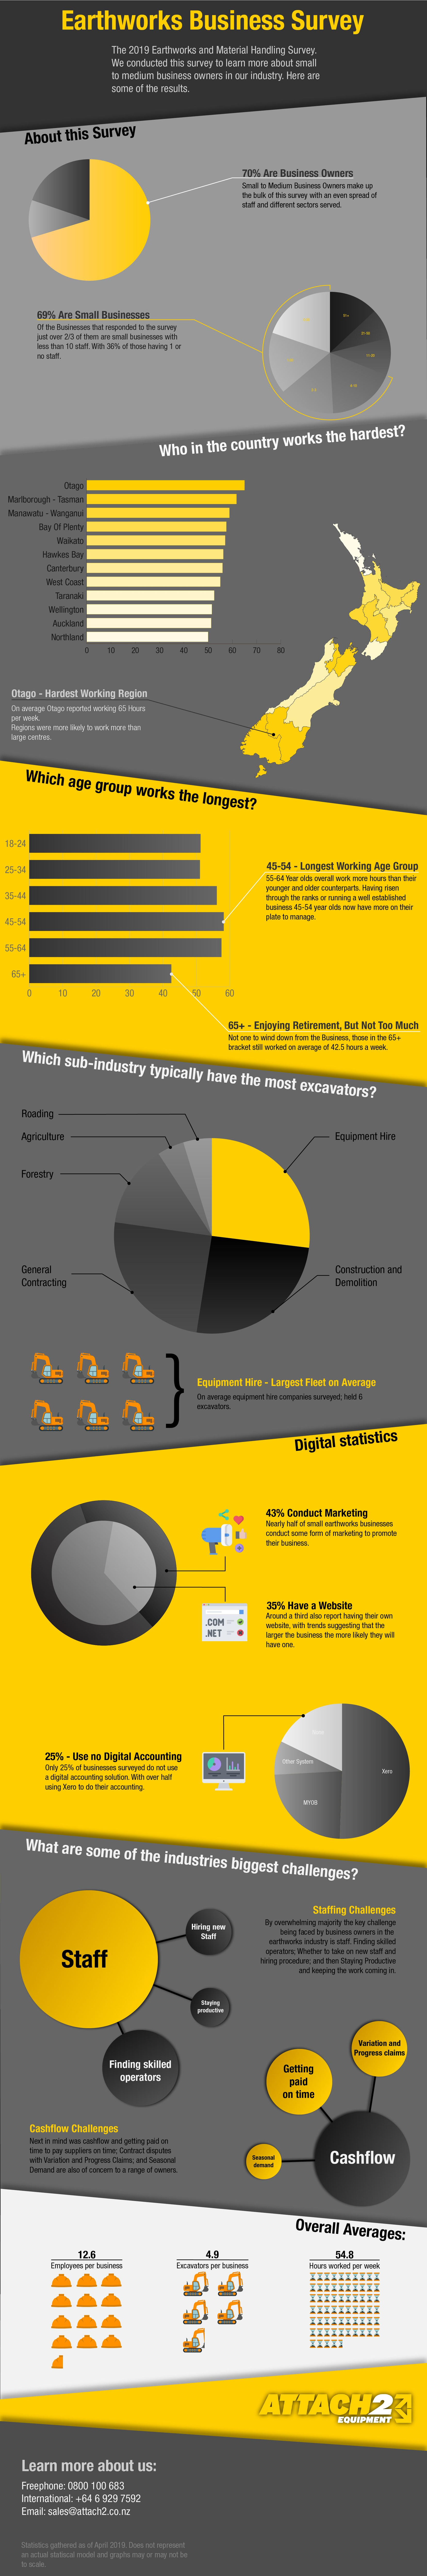 Earthworks and Material Handling Excavator Business Survey Infographic v4 Final